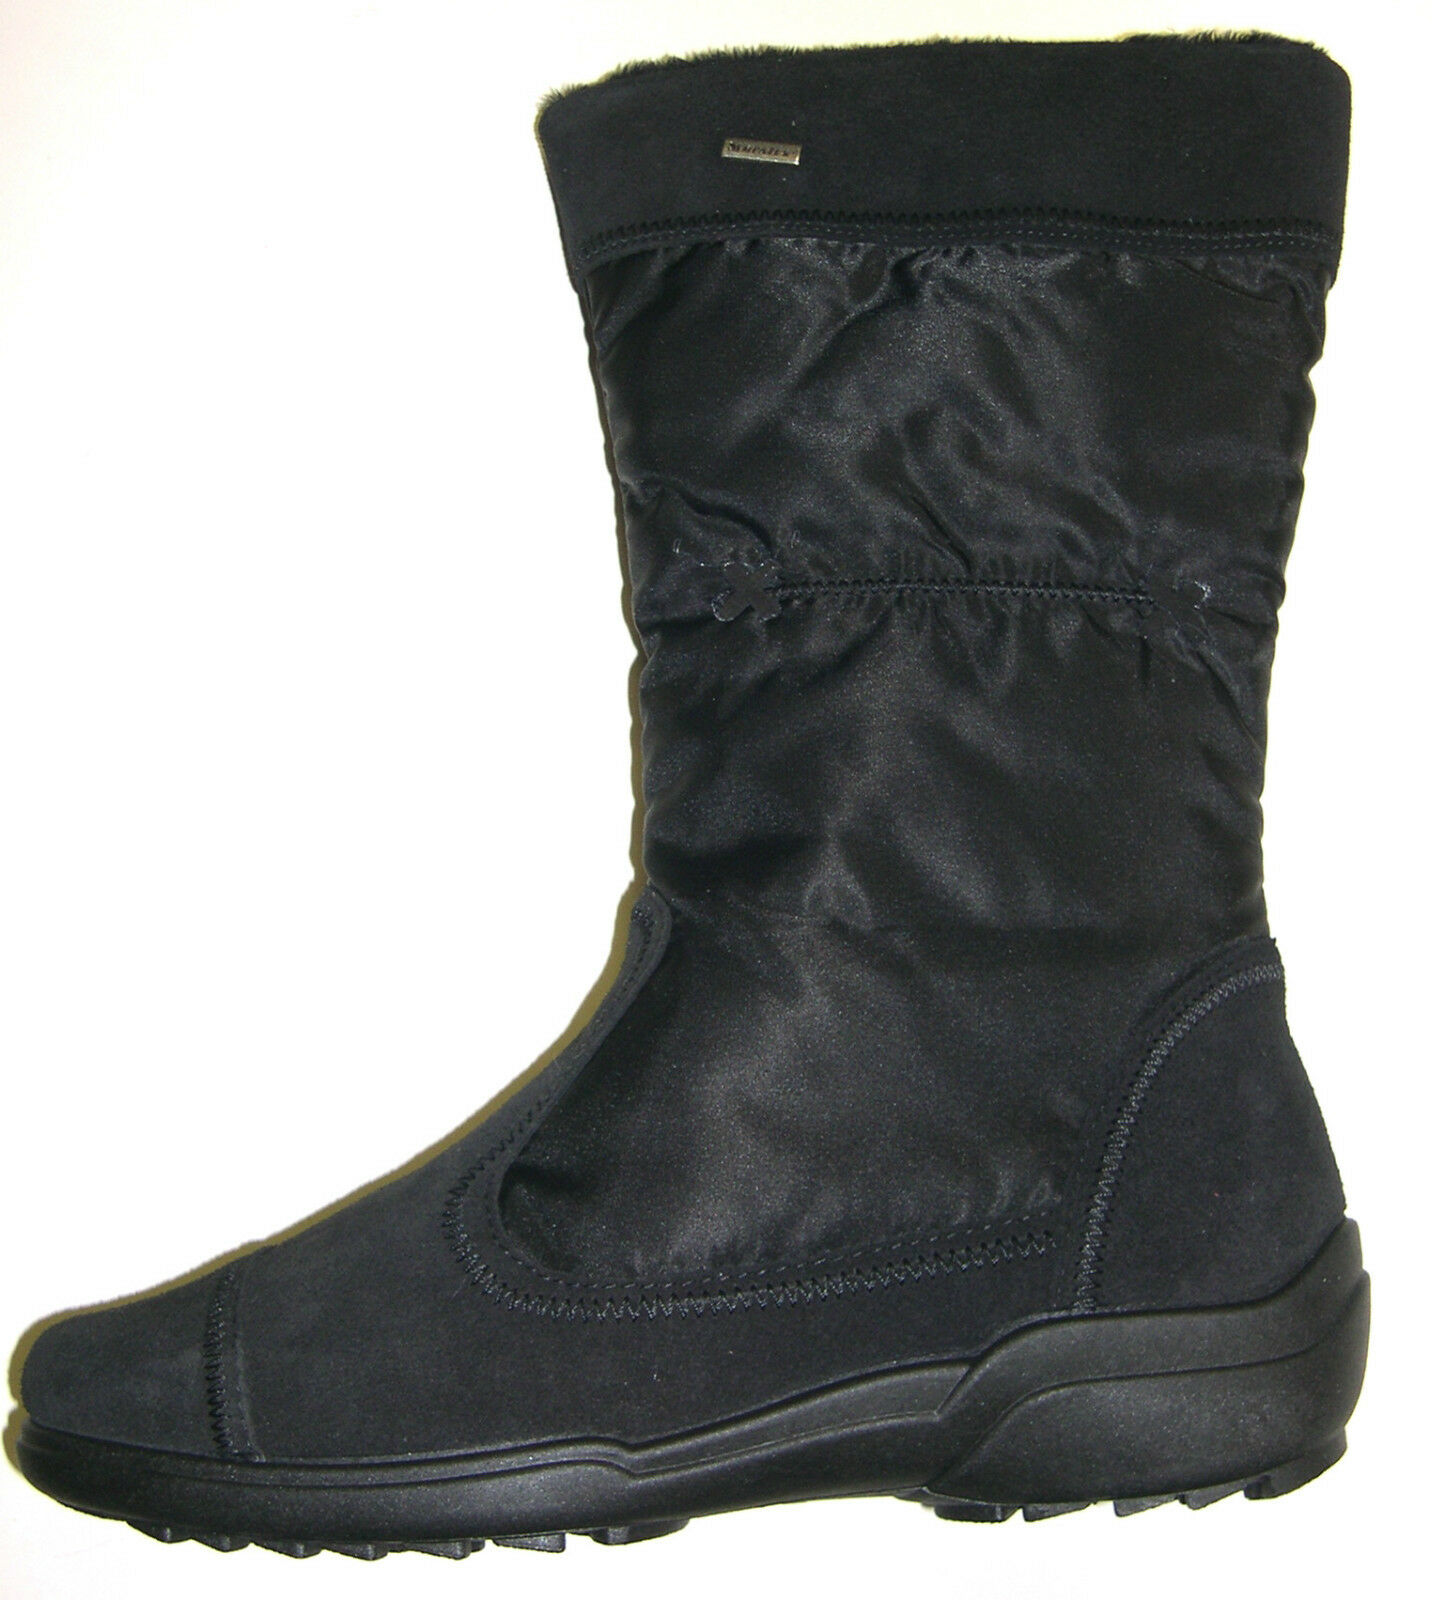 Rohde Damen Schuhe Stiefel Stiefelette Sympatex Warmfutter Art 2853 schwarz